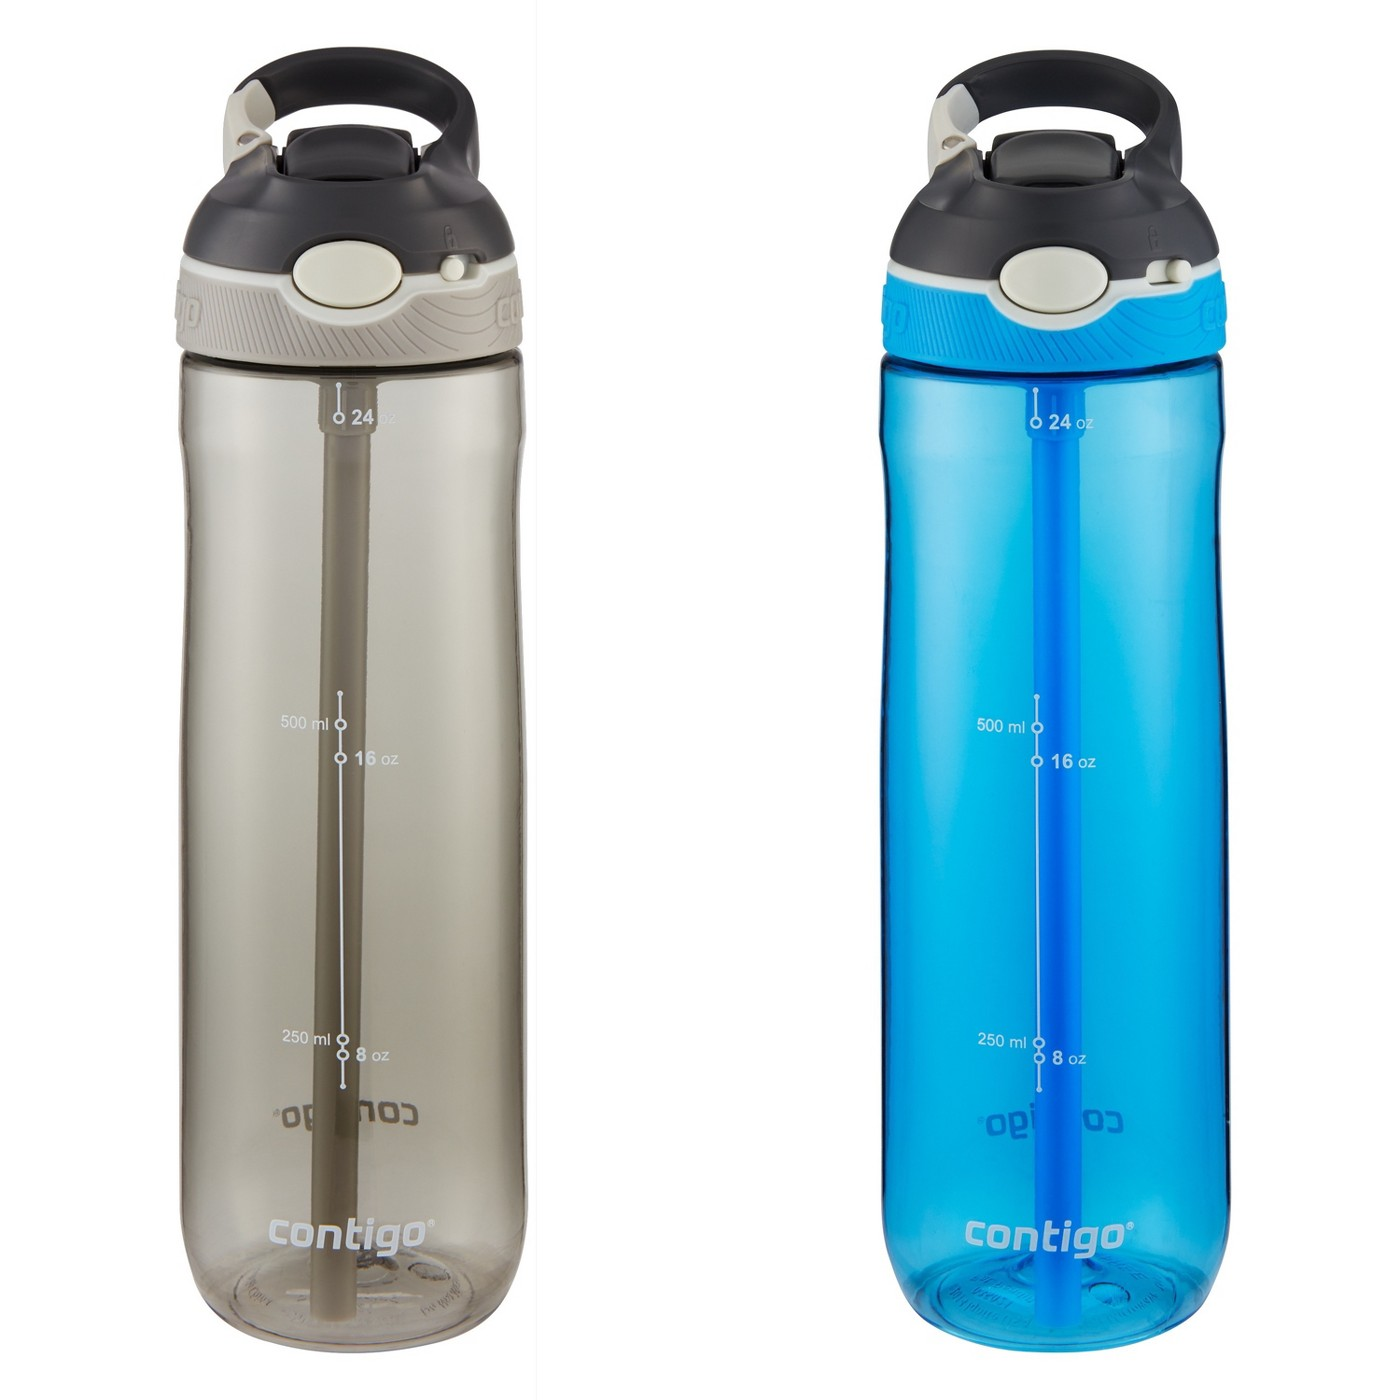 Contigo AUTOSPOUT Straw Ashland 24oz 2pk Water Bottle - image 1 of 6